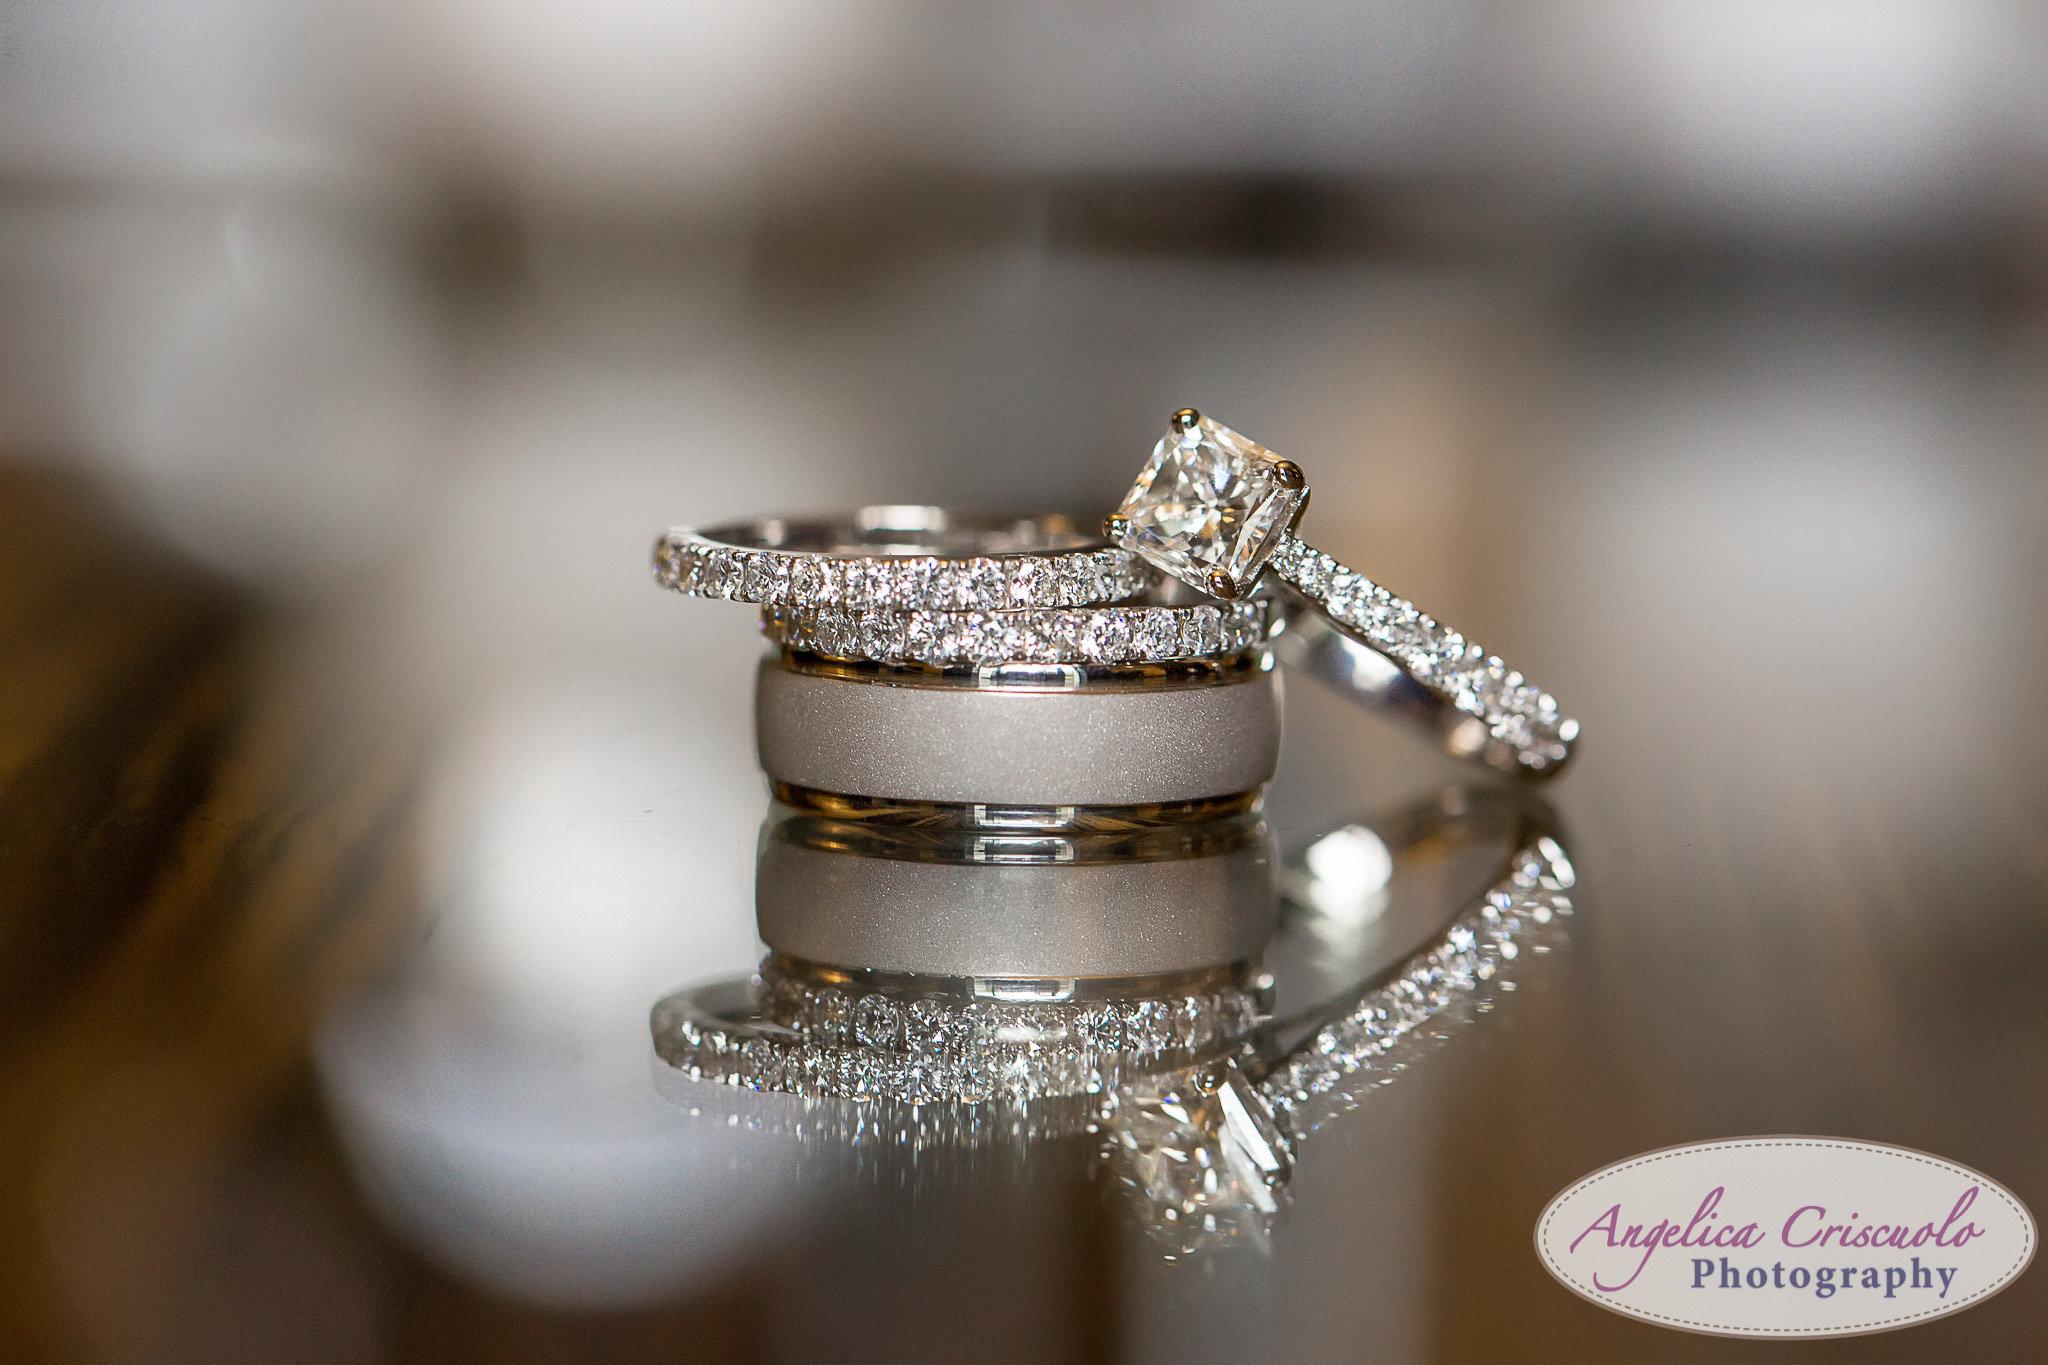 New York Wedding rings